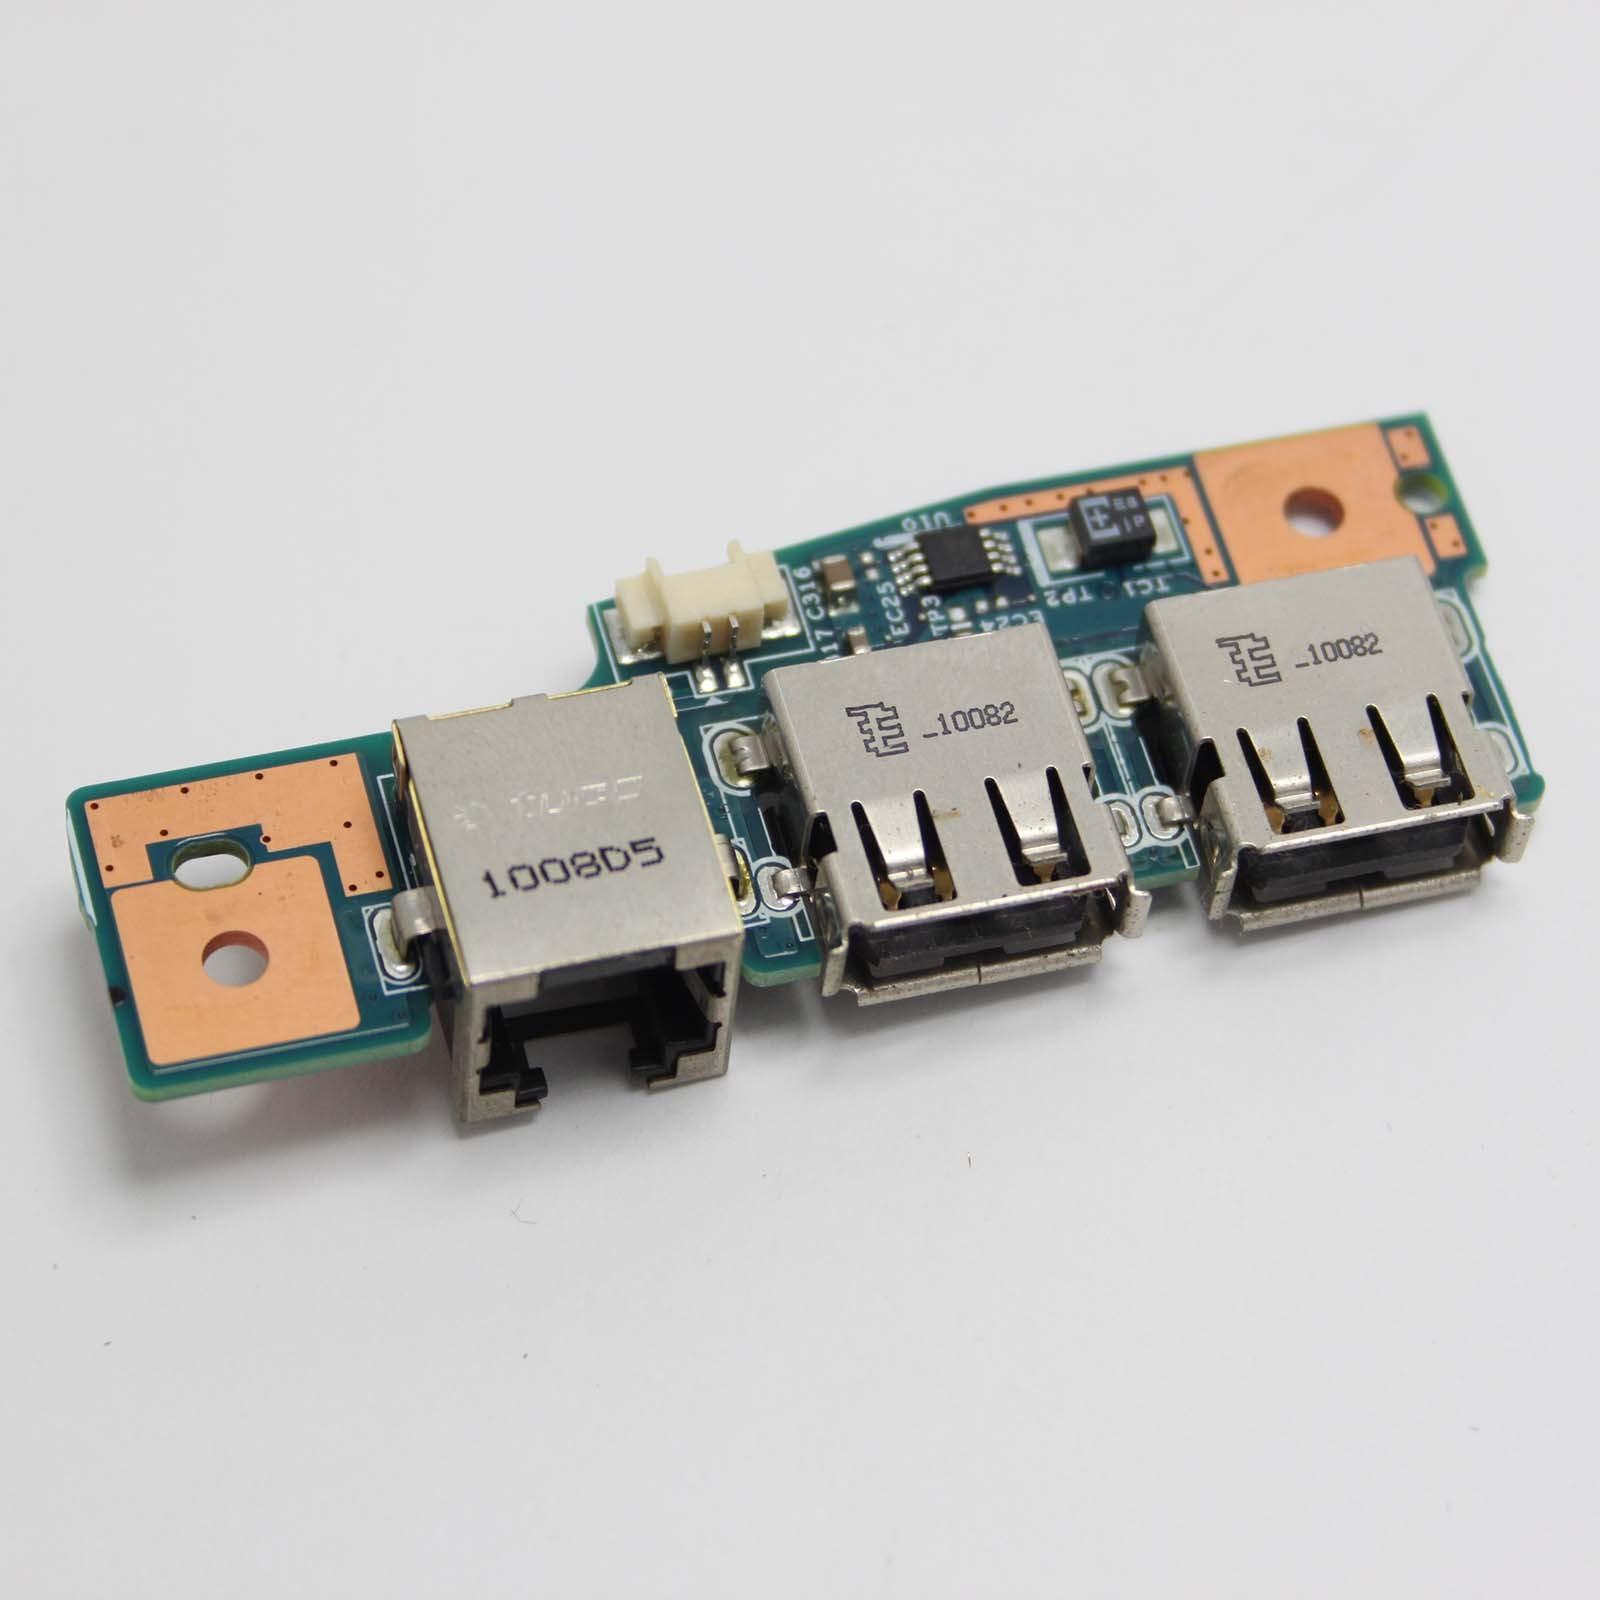 Porte USB Packard Bell Easynote TJ65 MS2273 ingresso modem 48.4BU02.01M